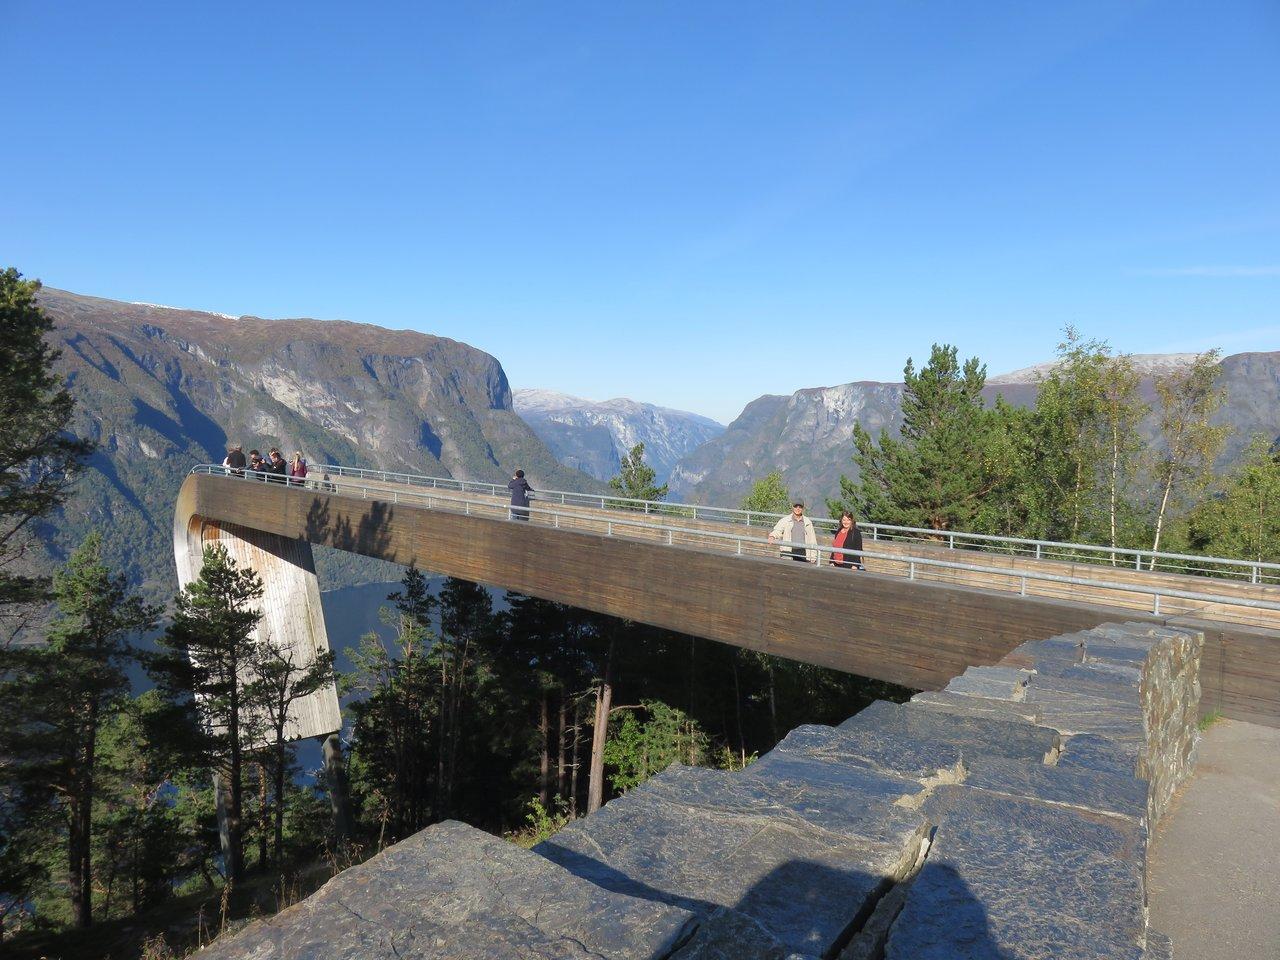 Stegastein Viewpoint | Photo taken by Mary K